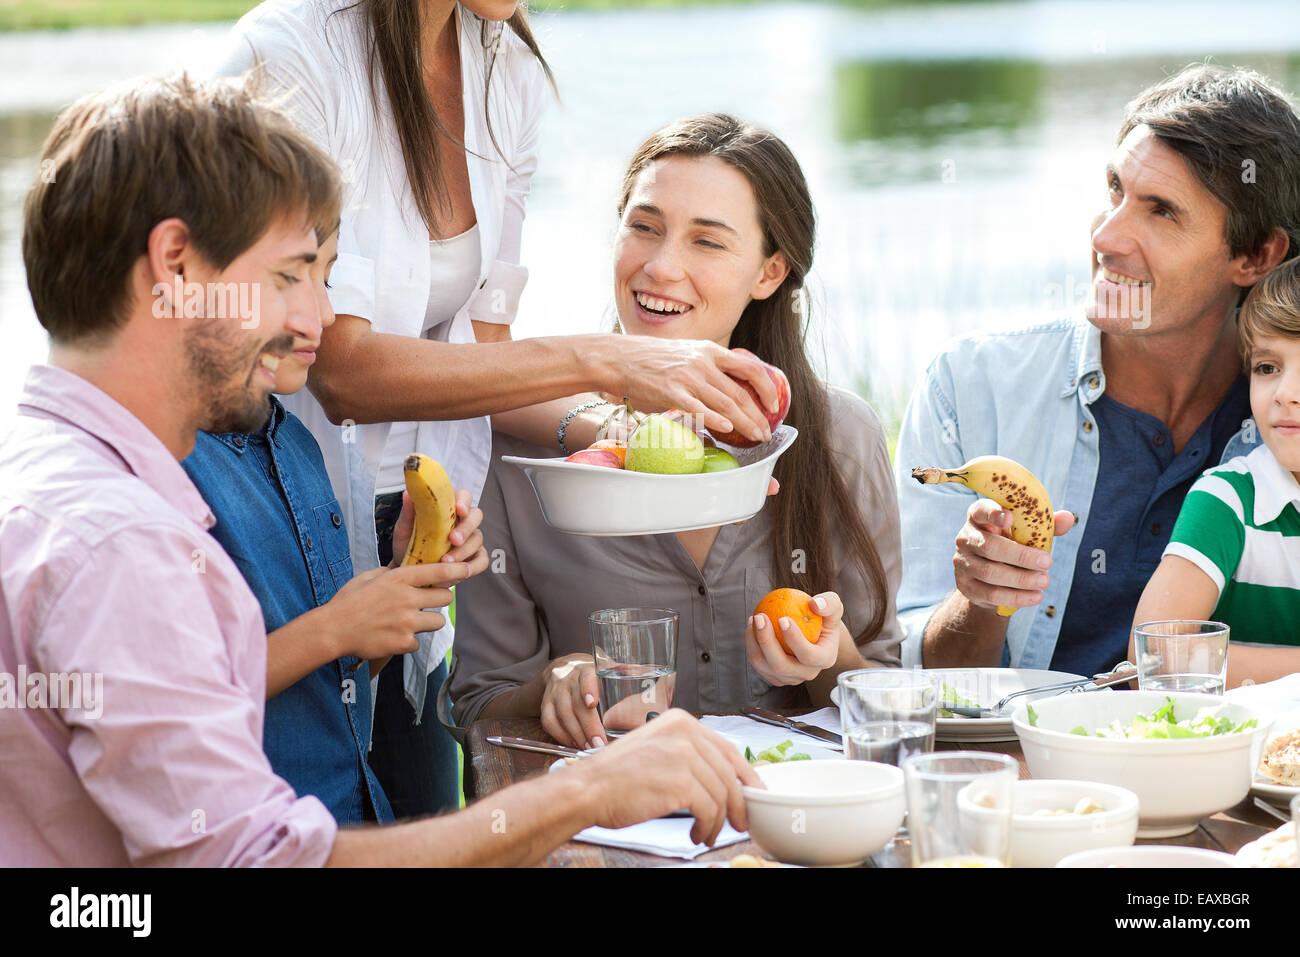 Family enjoying healthy picnic - Stock Image